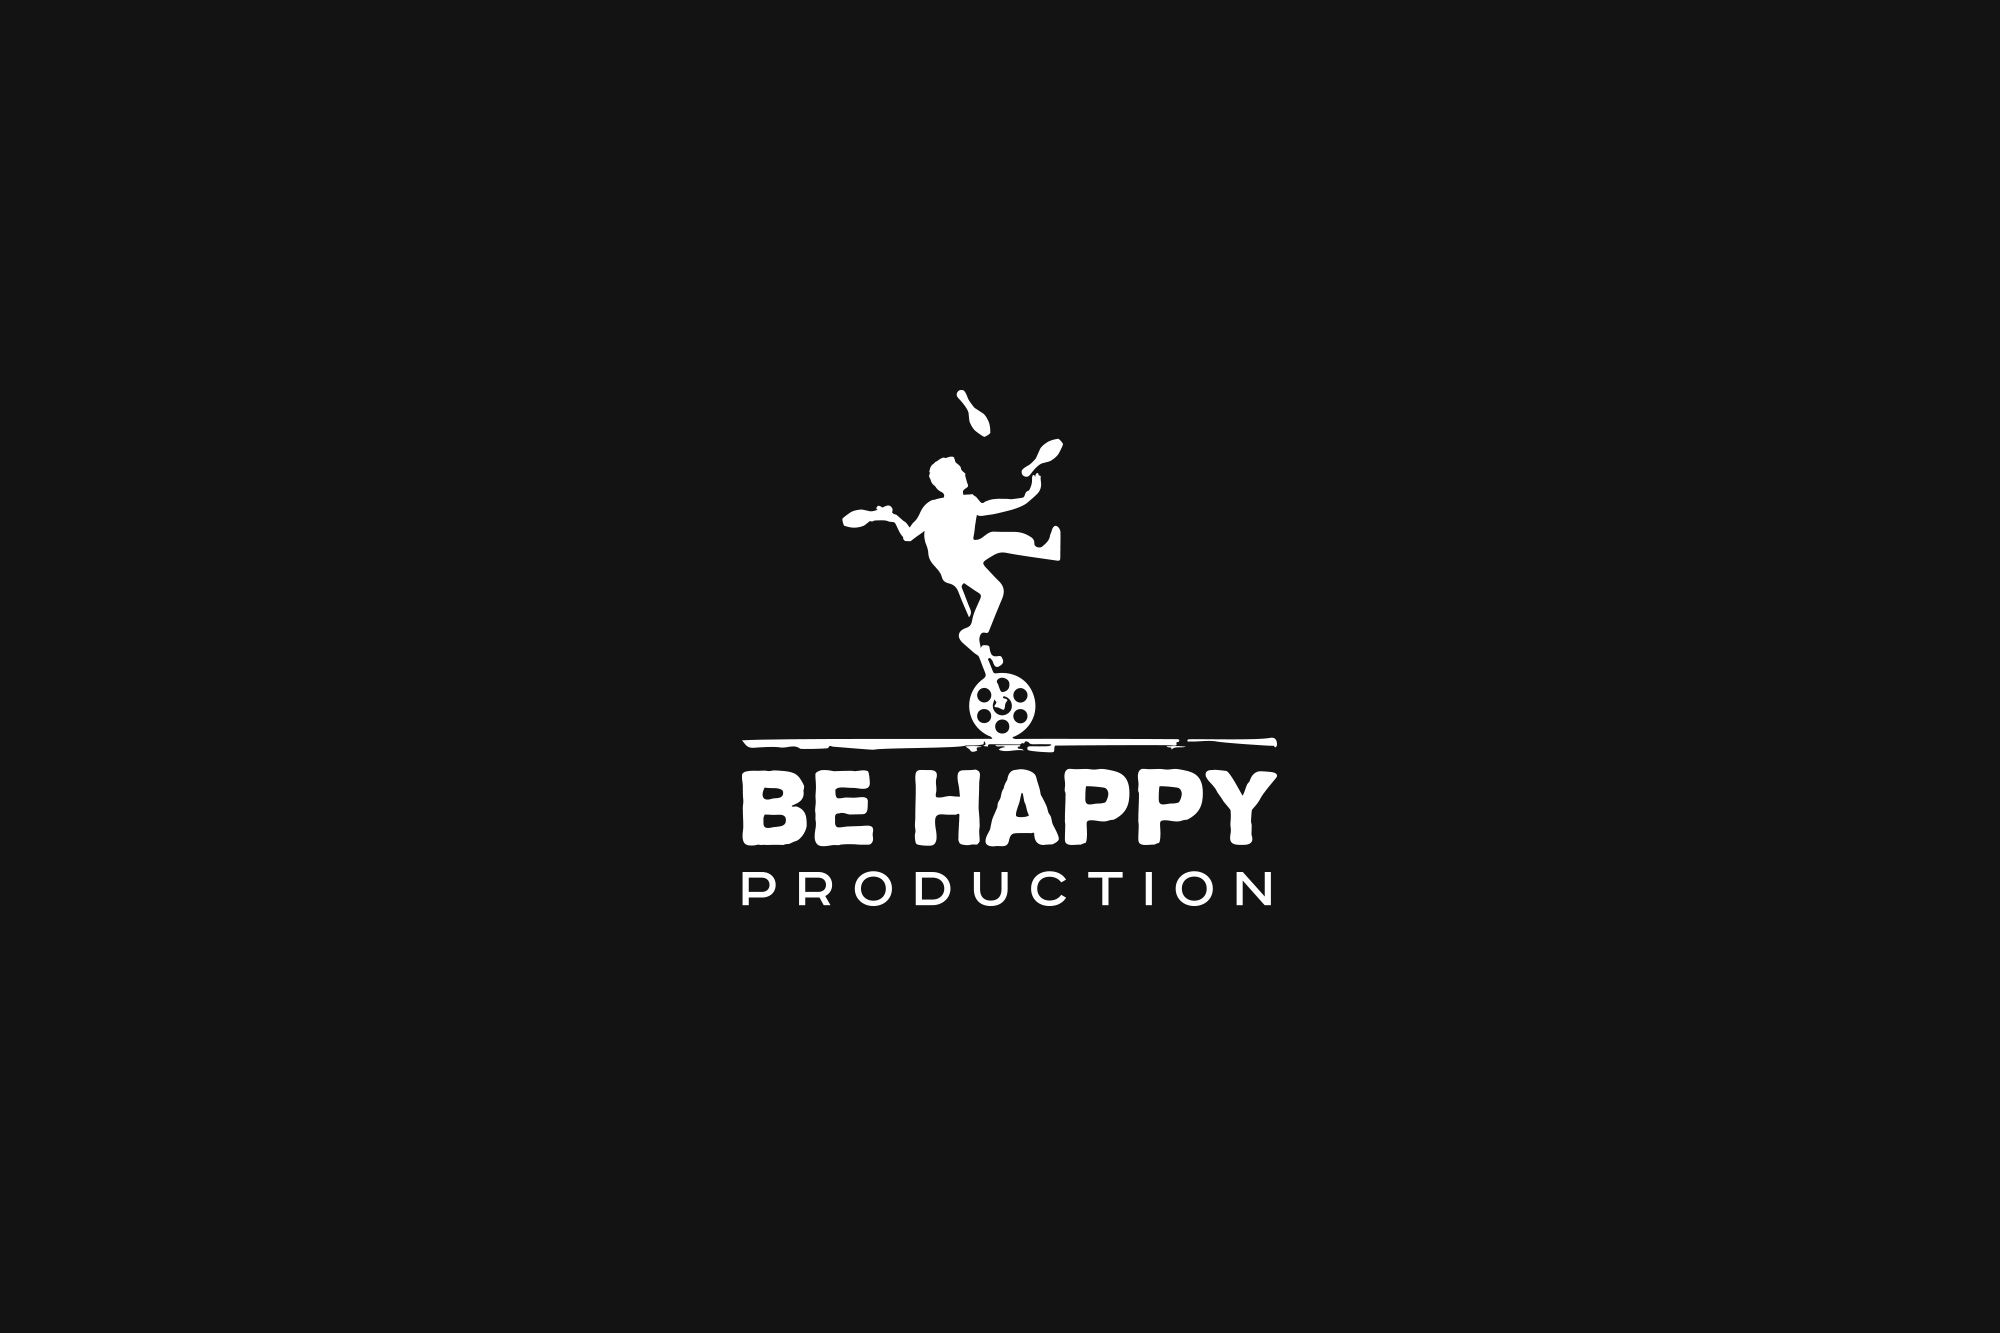 Логотип для Be Happy Production  - дизайнер Teriyakki